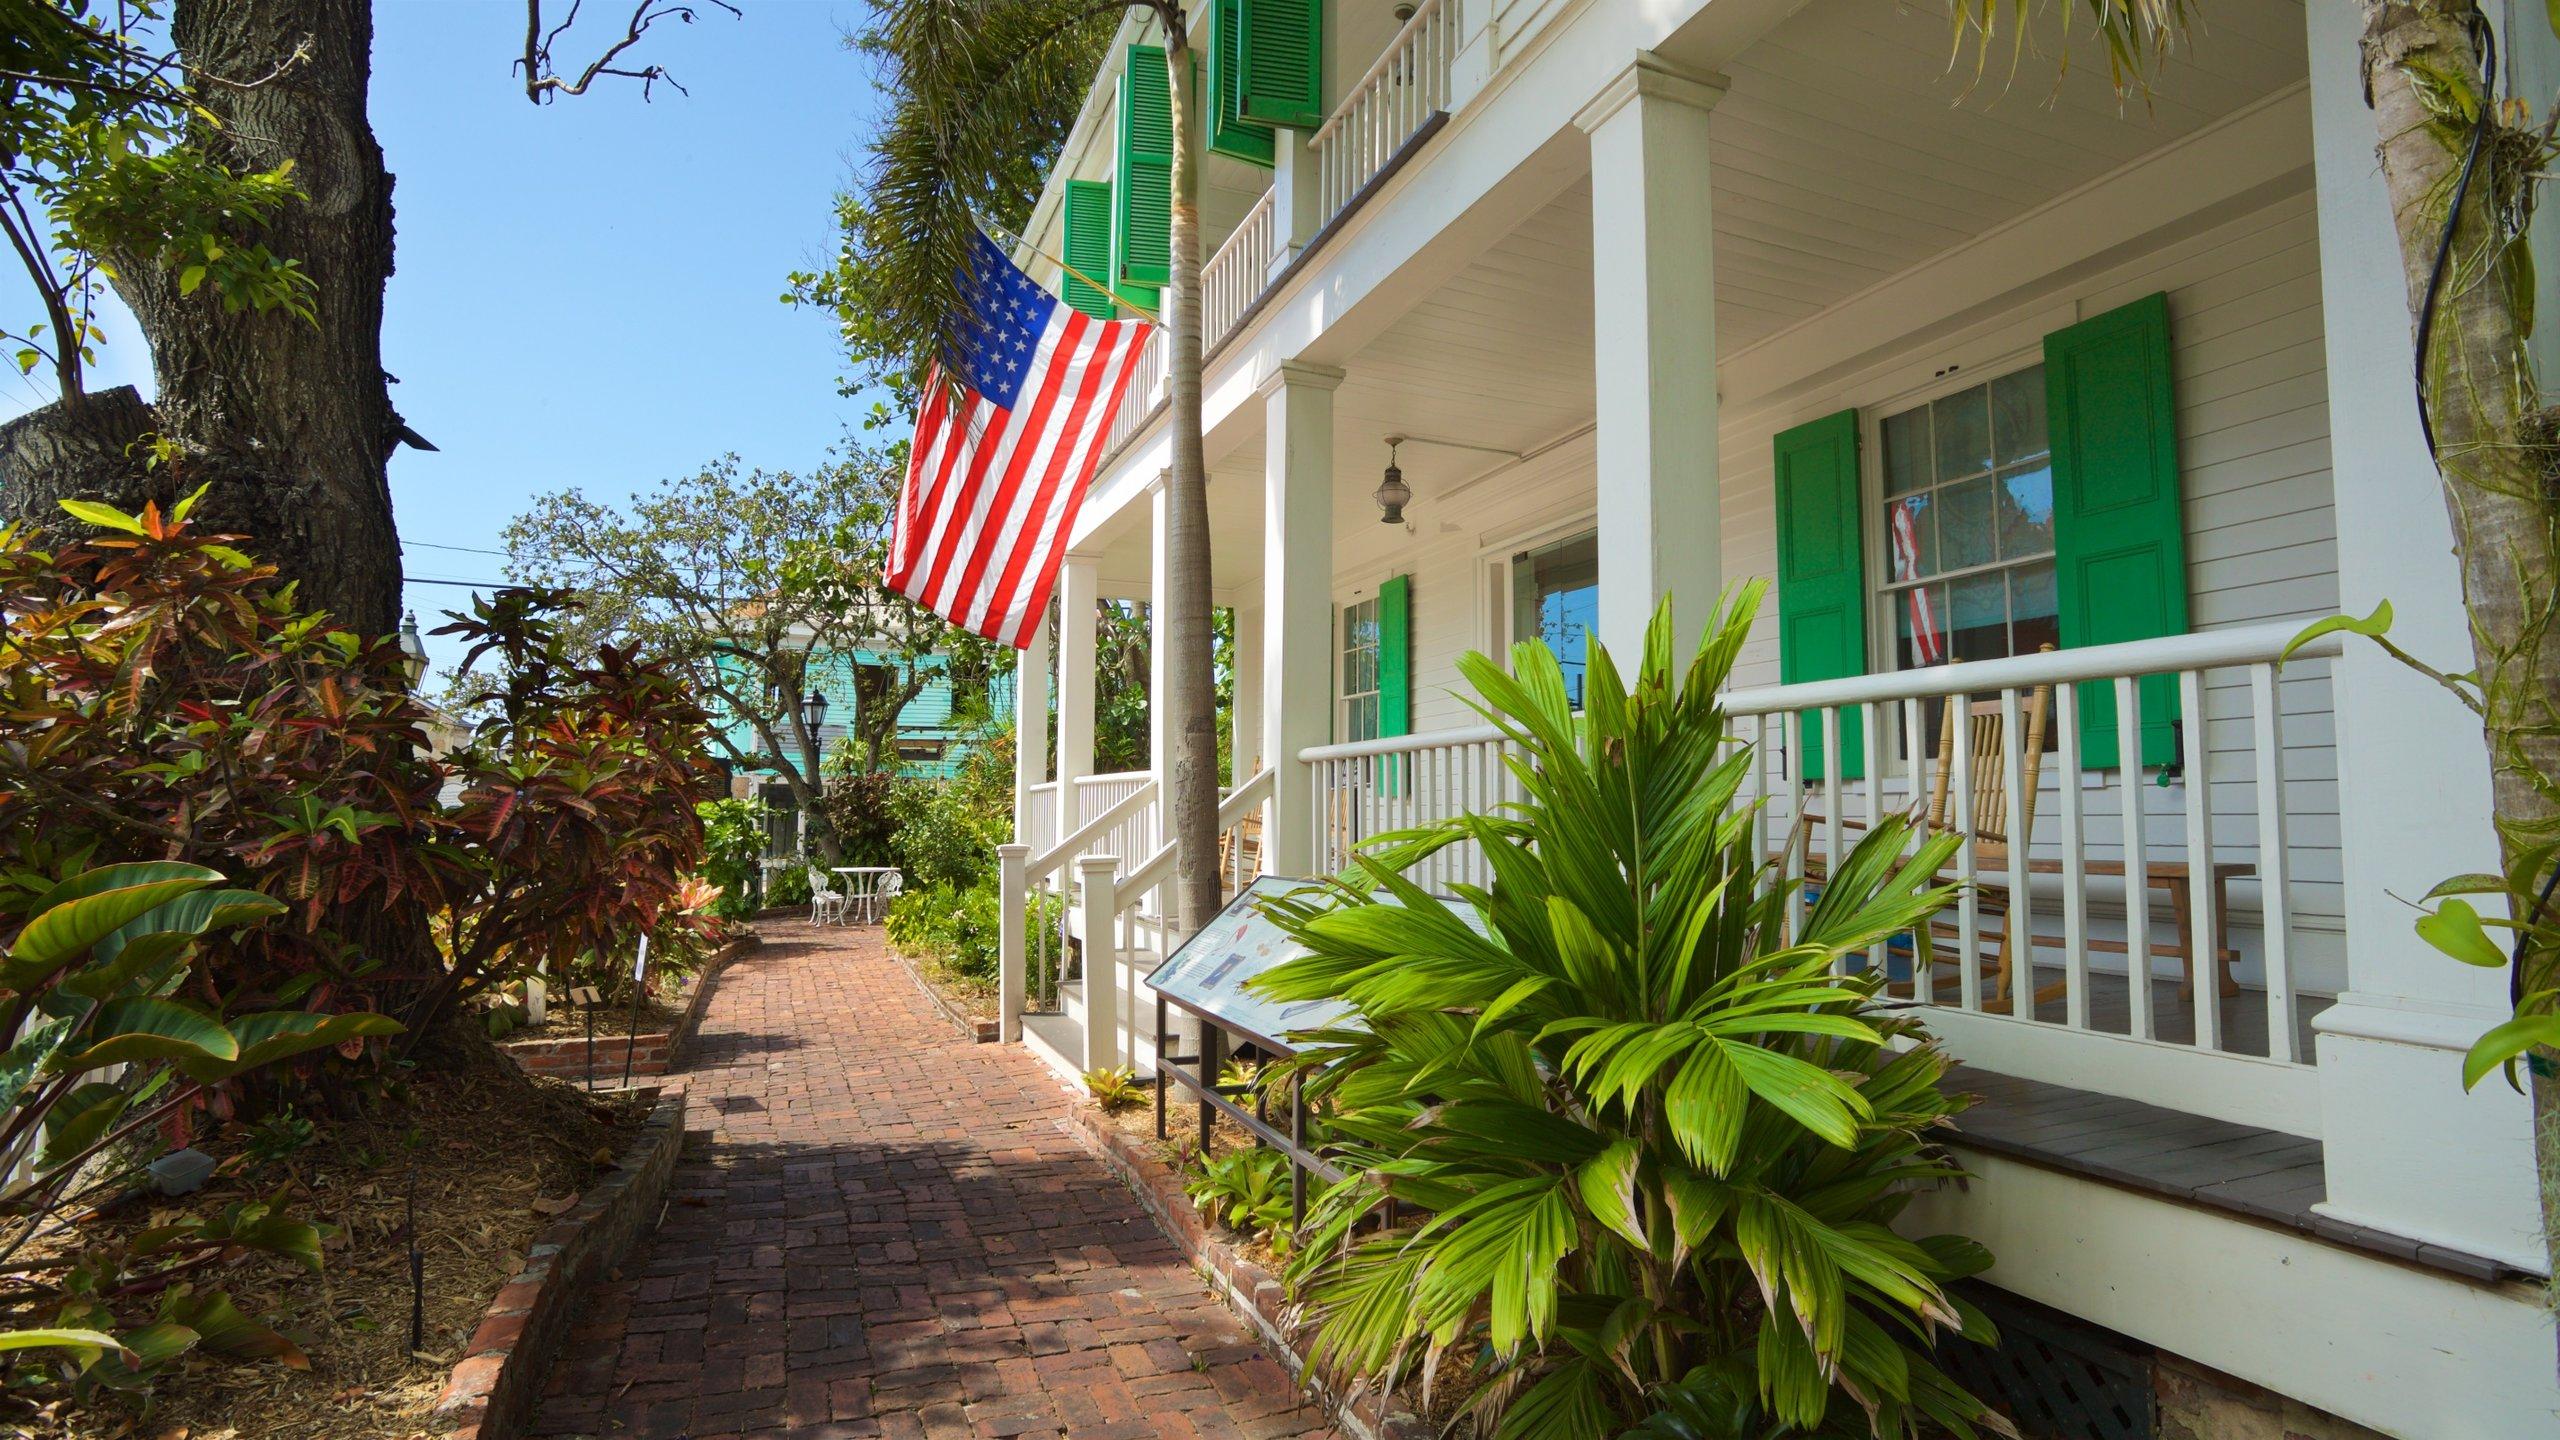 Audubon House and Tropical Gardens, Key West, Florida, United States of America